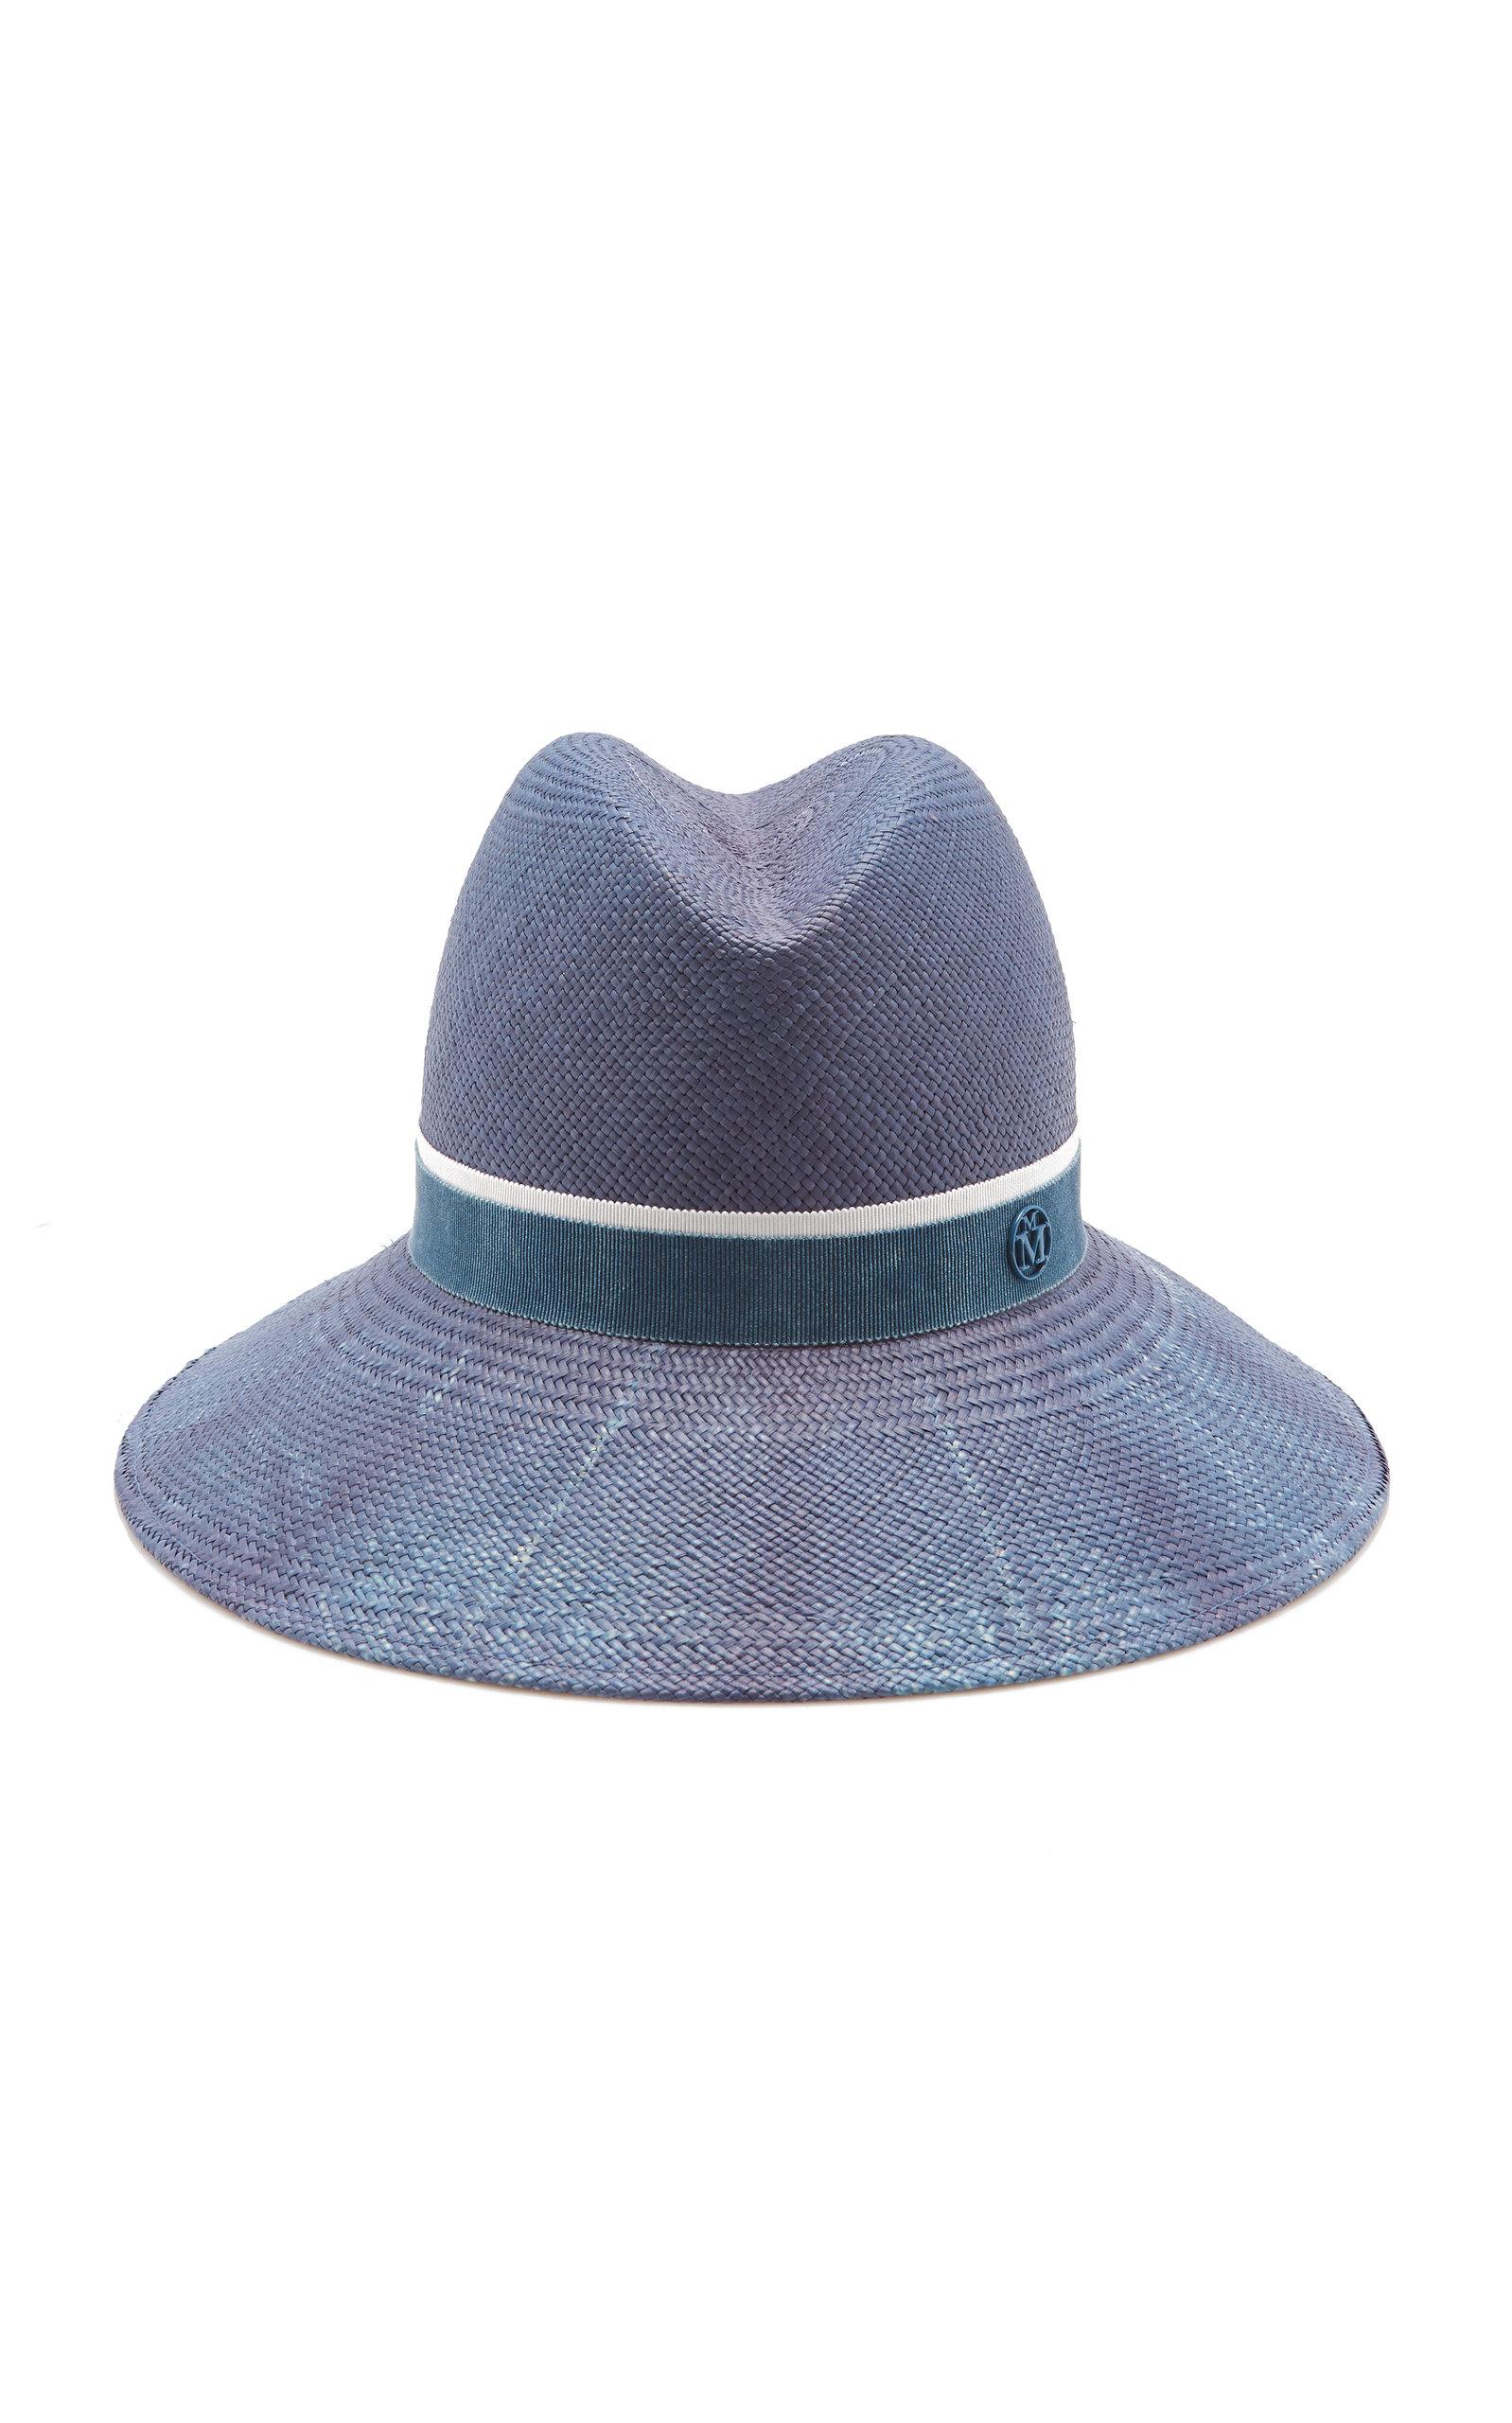 GINGER STRAW HAT